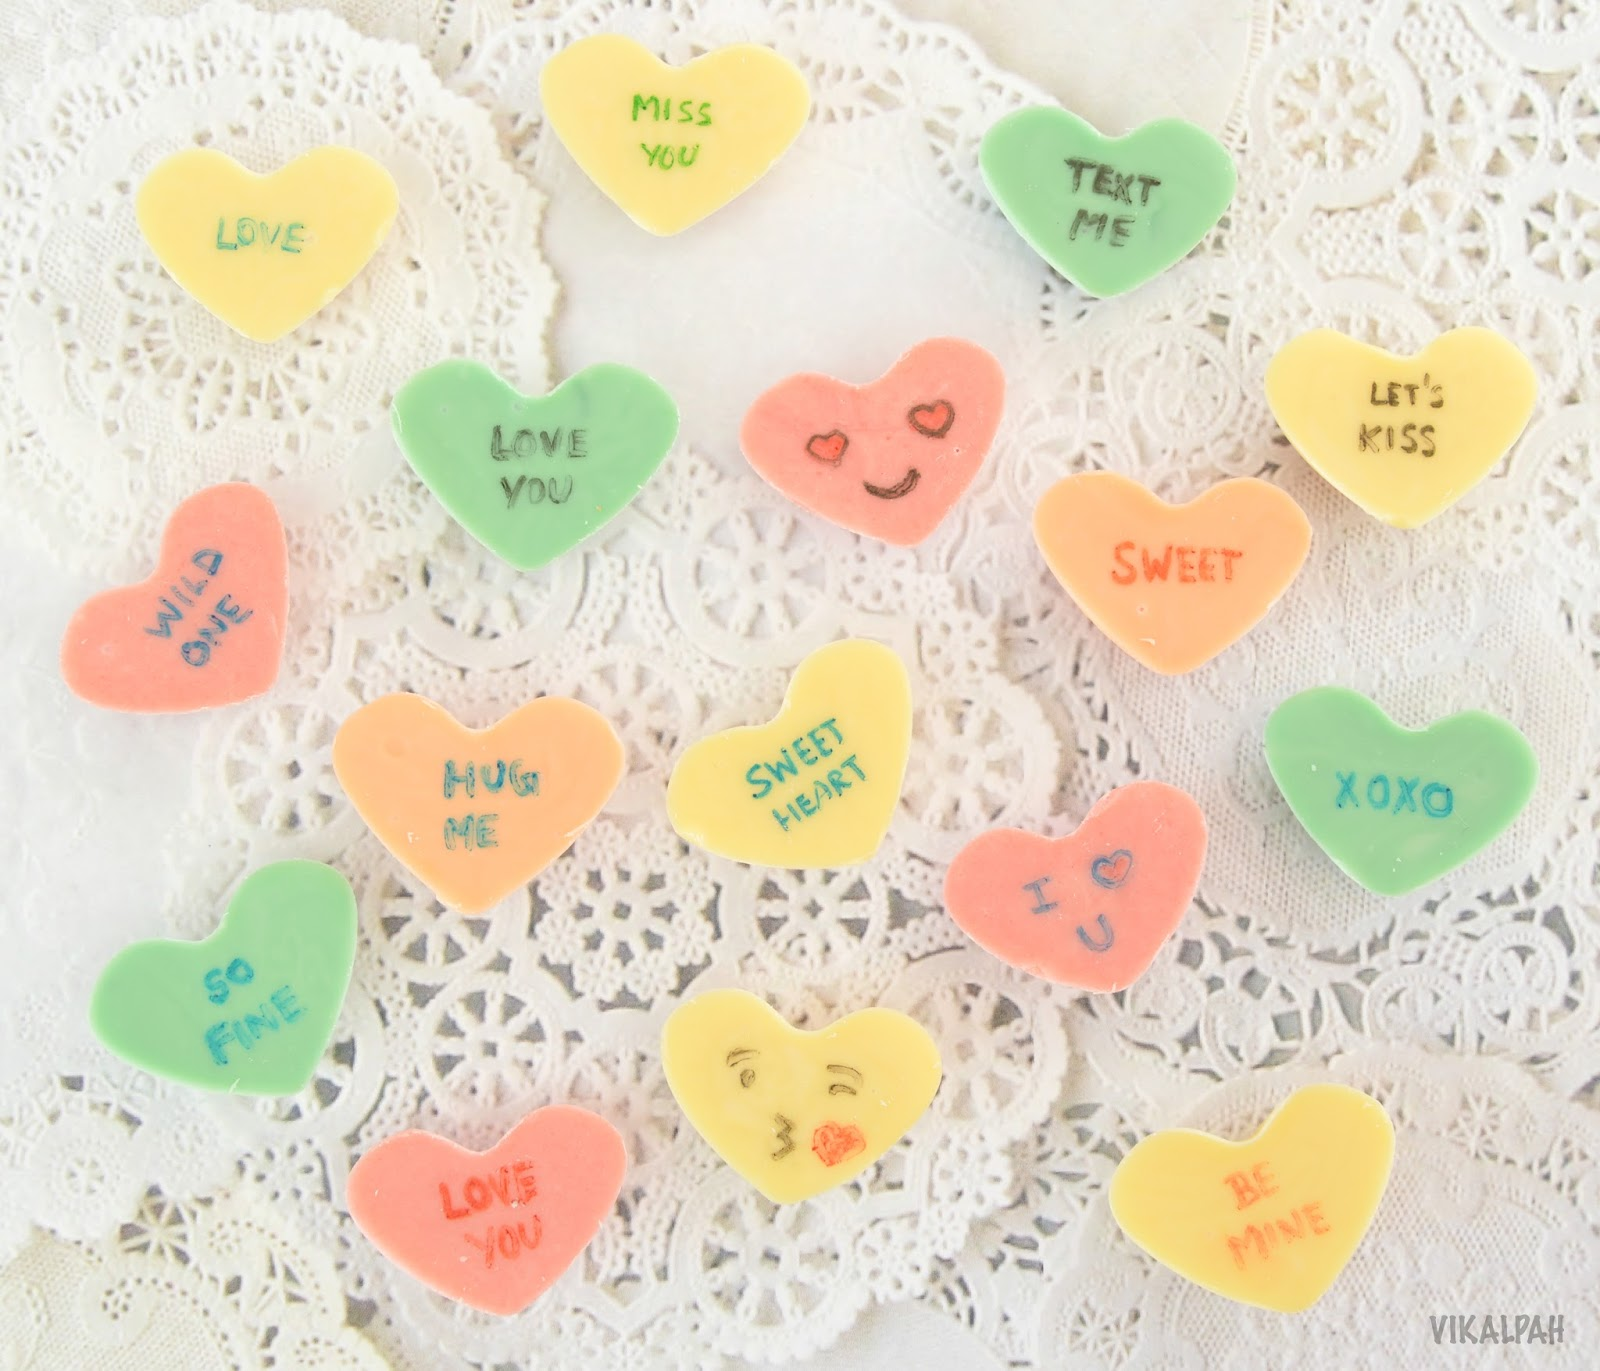 Vikalpah: DIY Conversation Hearts Chocolate